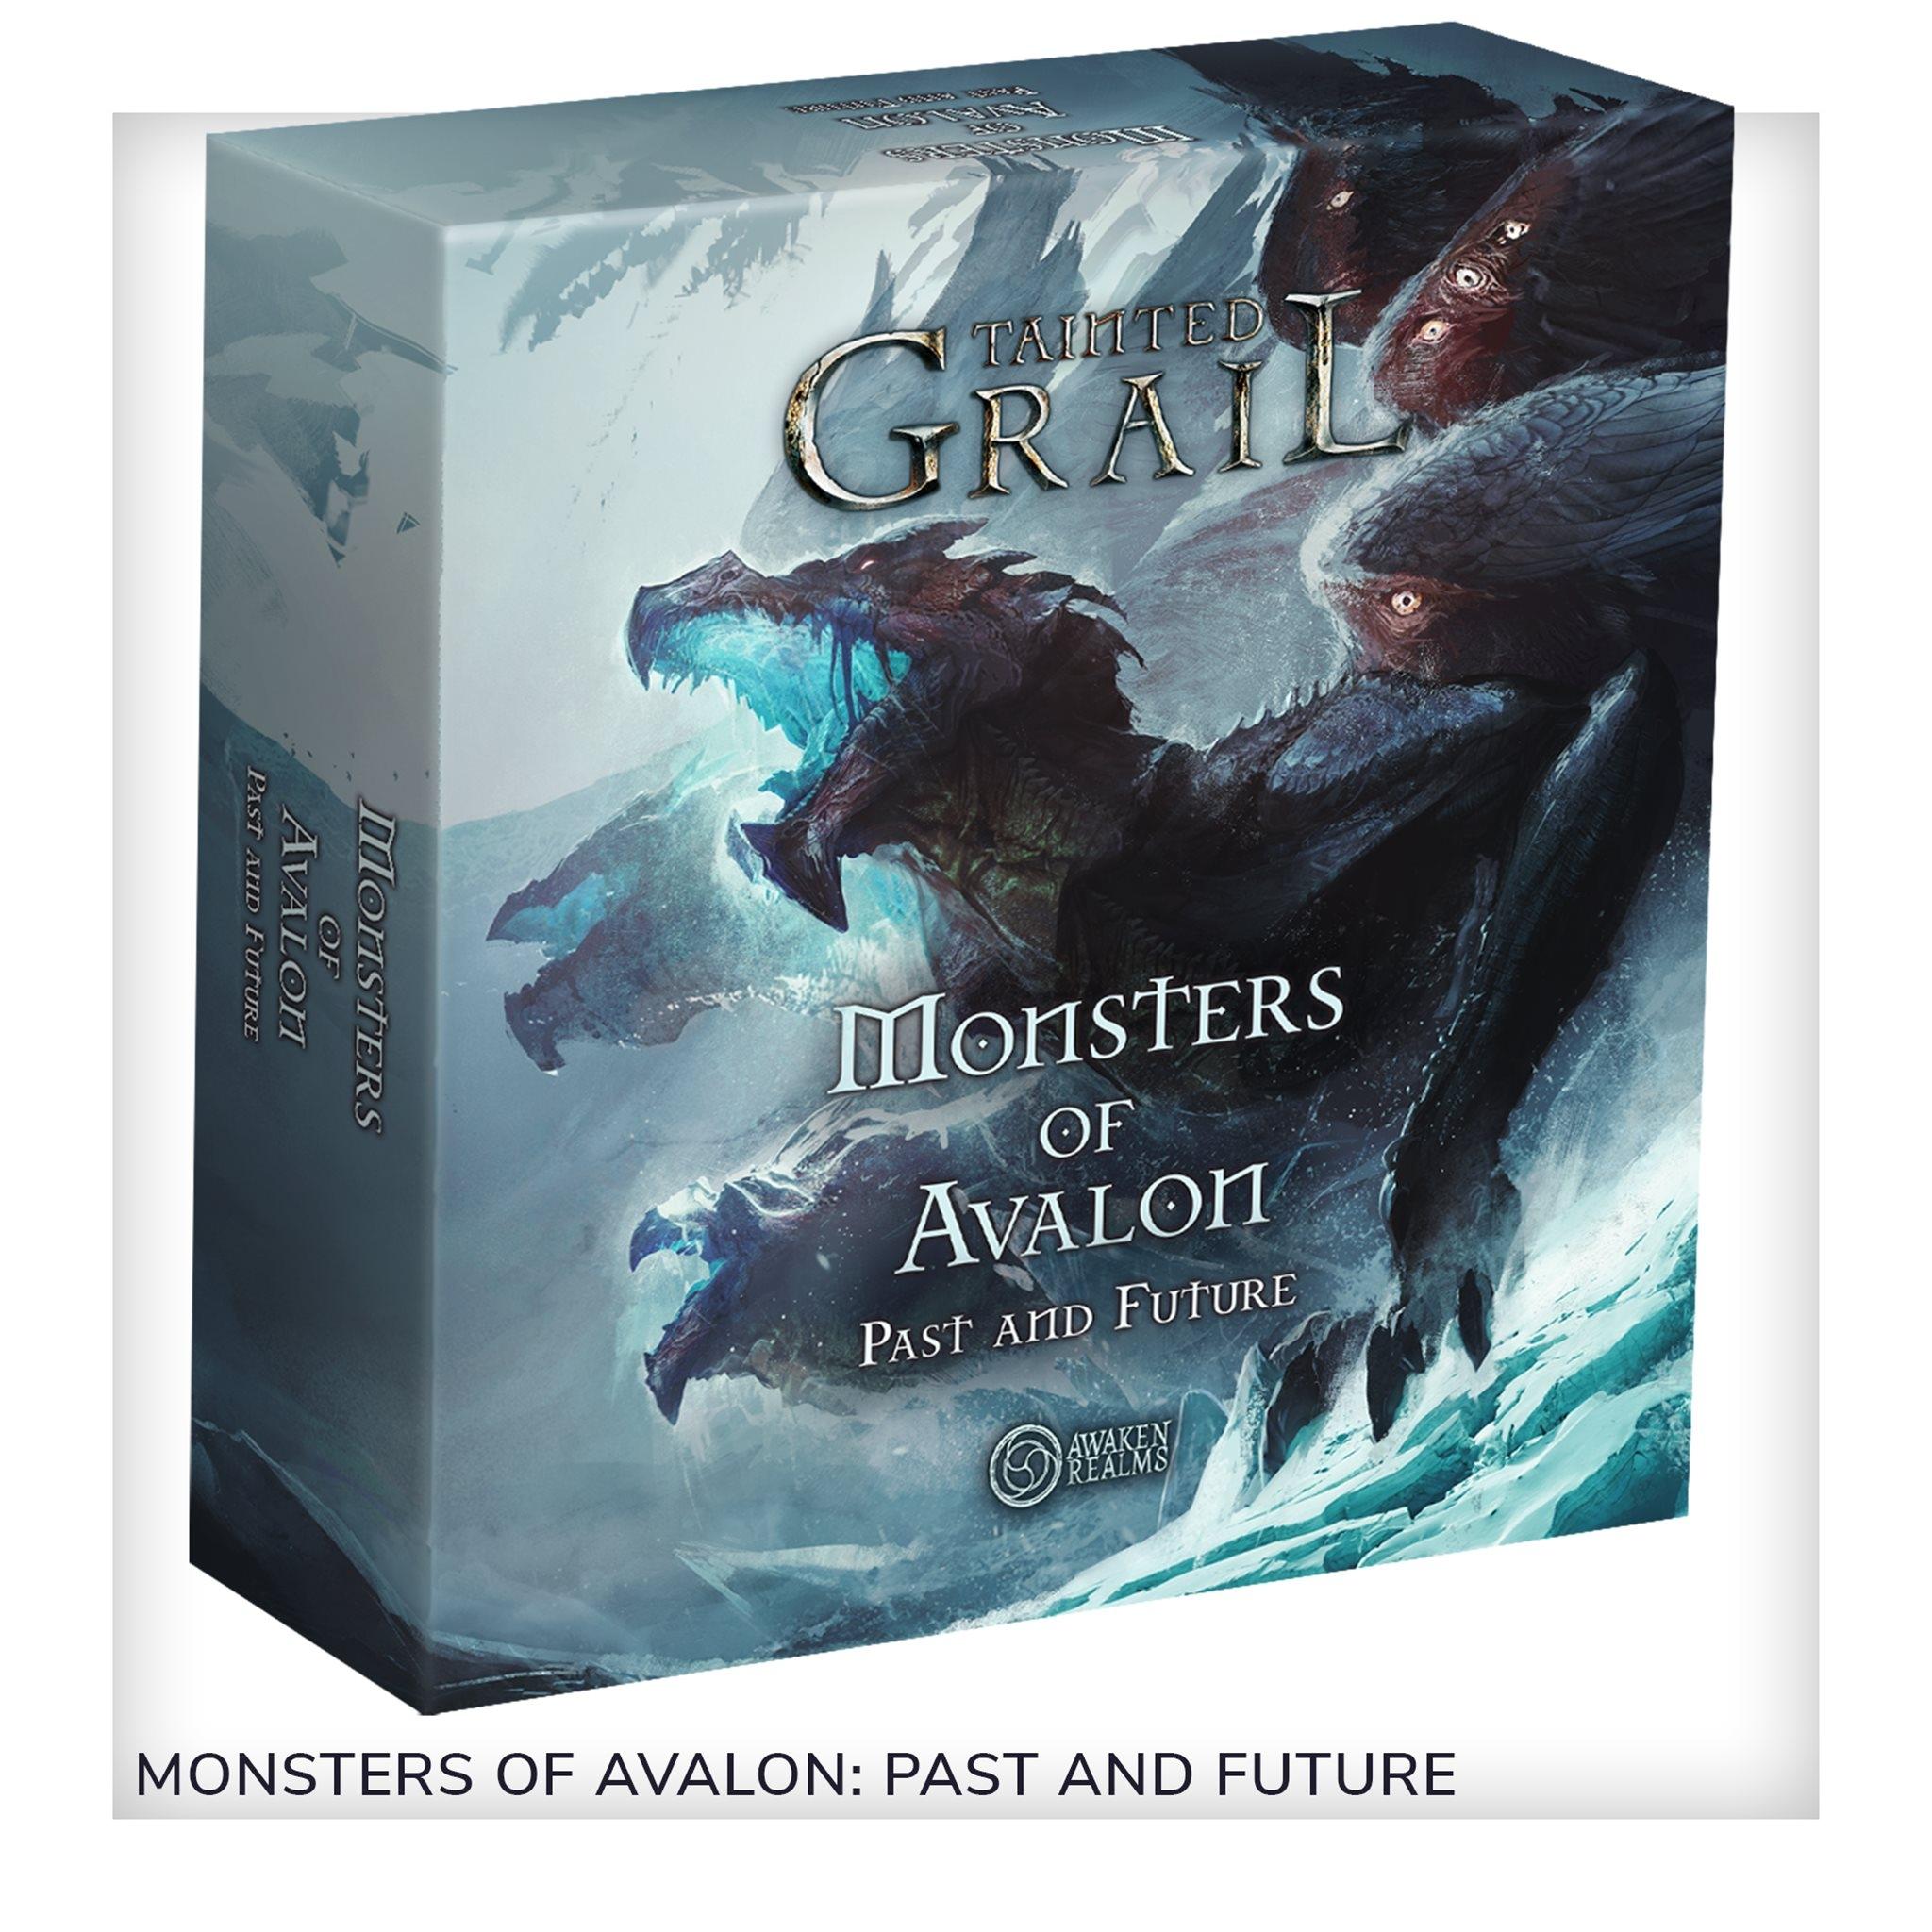 Tainted Grail: The Fall of Avalon - Monsters Of Avalon: Past And The Future (edycja polska) (przedsprzedaż)